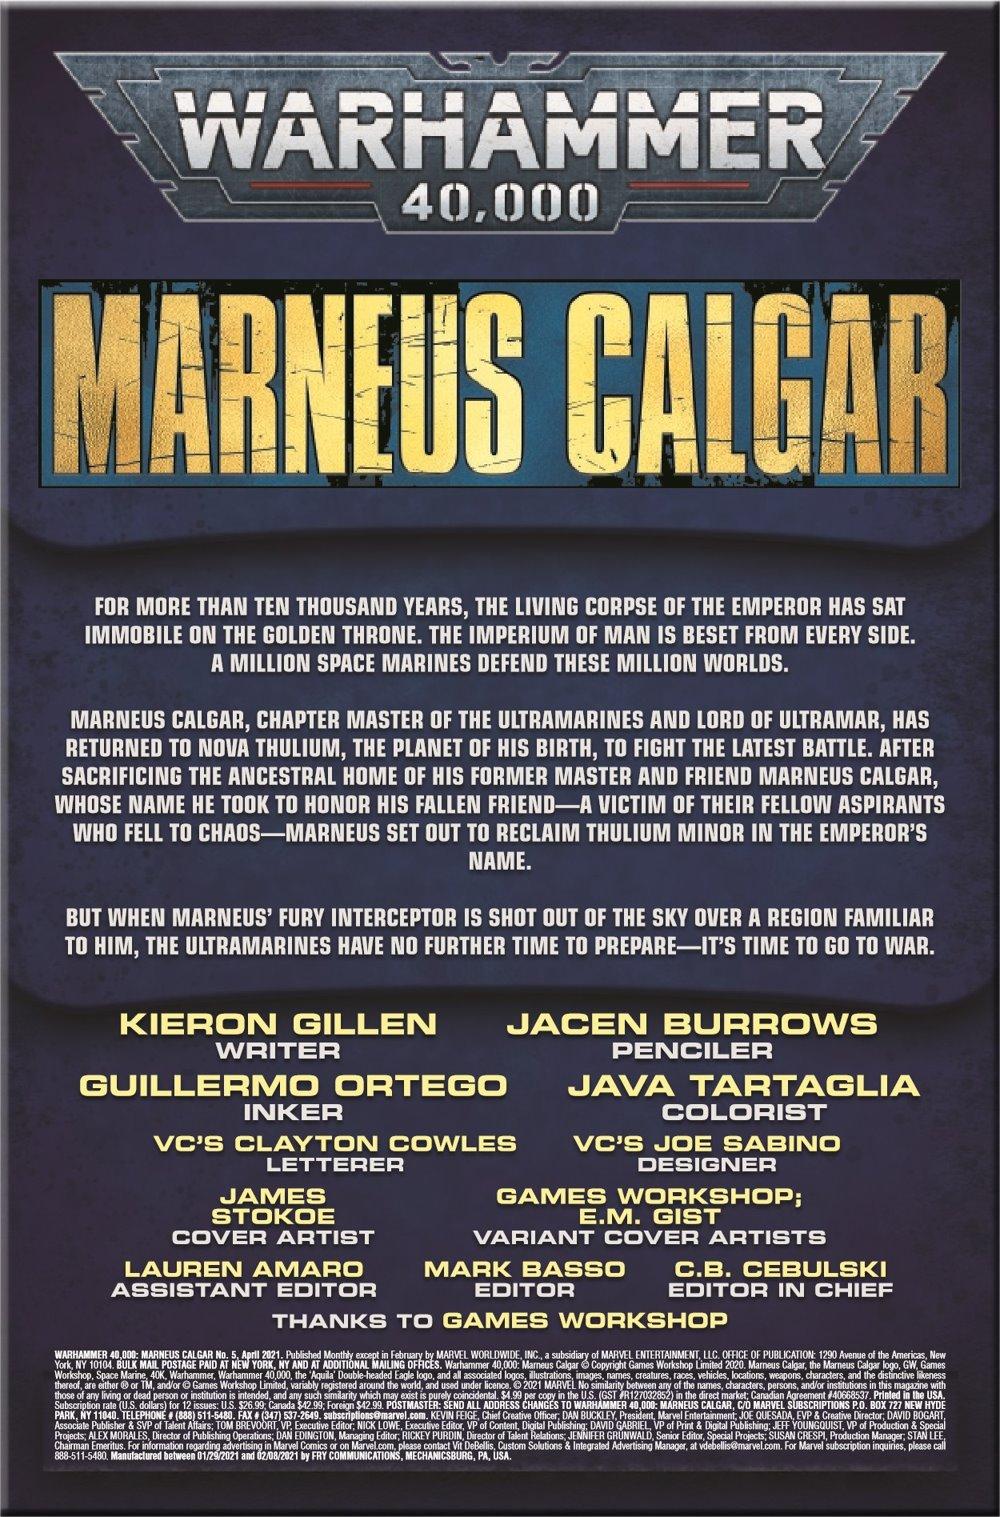 WARHAMMERMC2020005_Preview-2 ComicList Previews: WARHAMMER 40000 MARNEUS CALGAR #5 (OF 5)